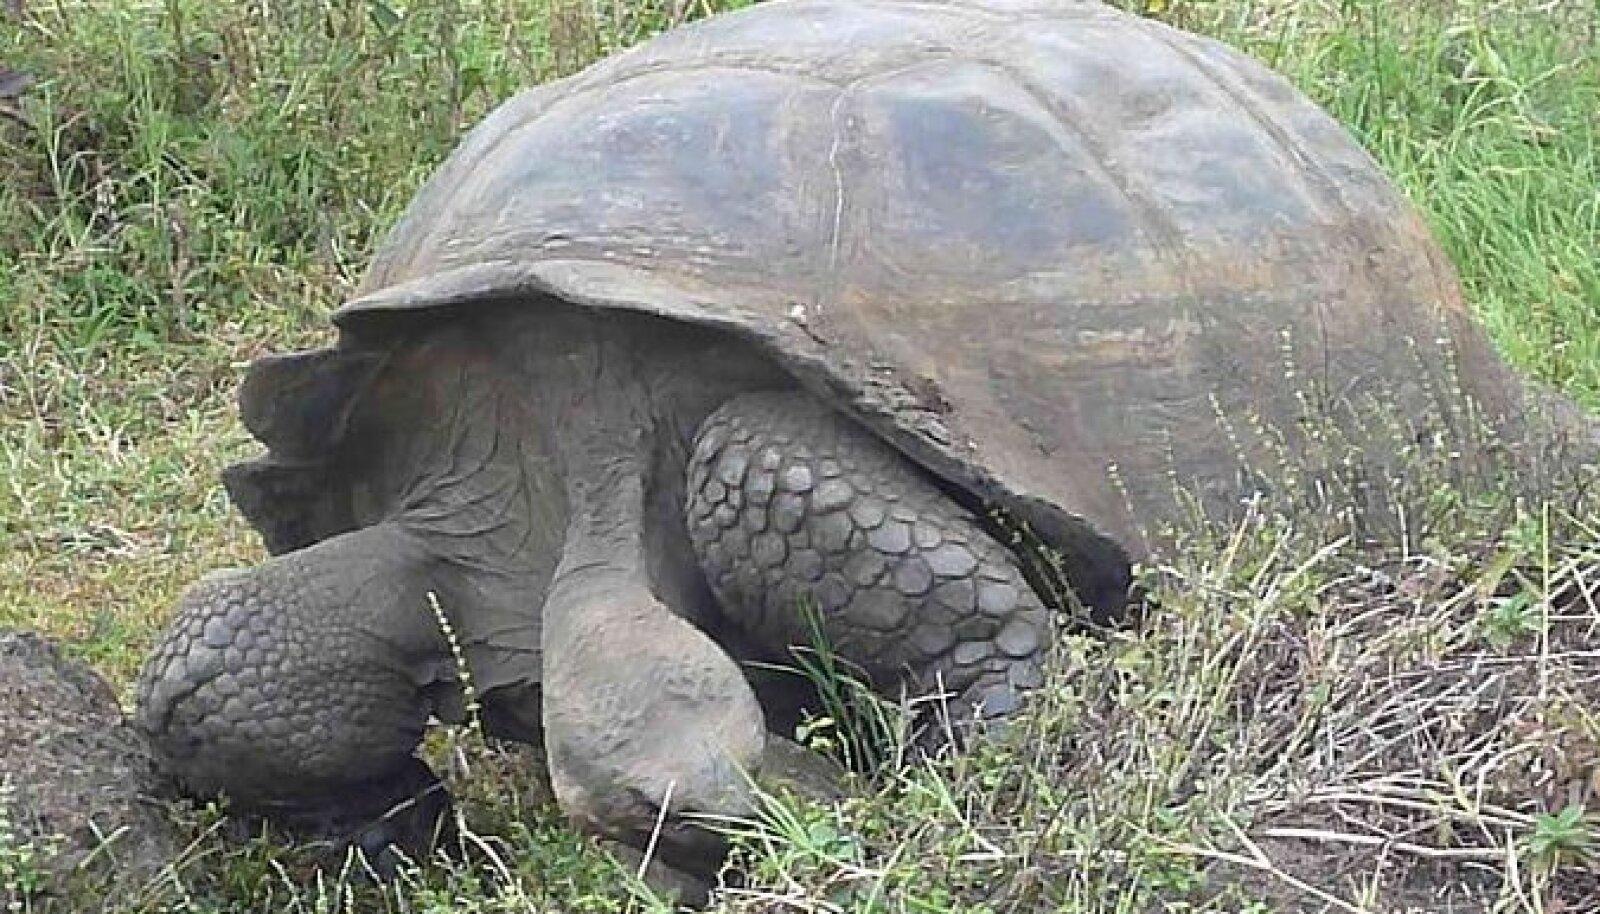 Galapagose elevantkilpkonn